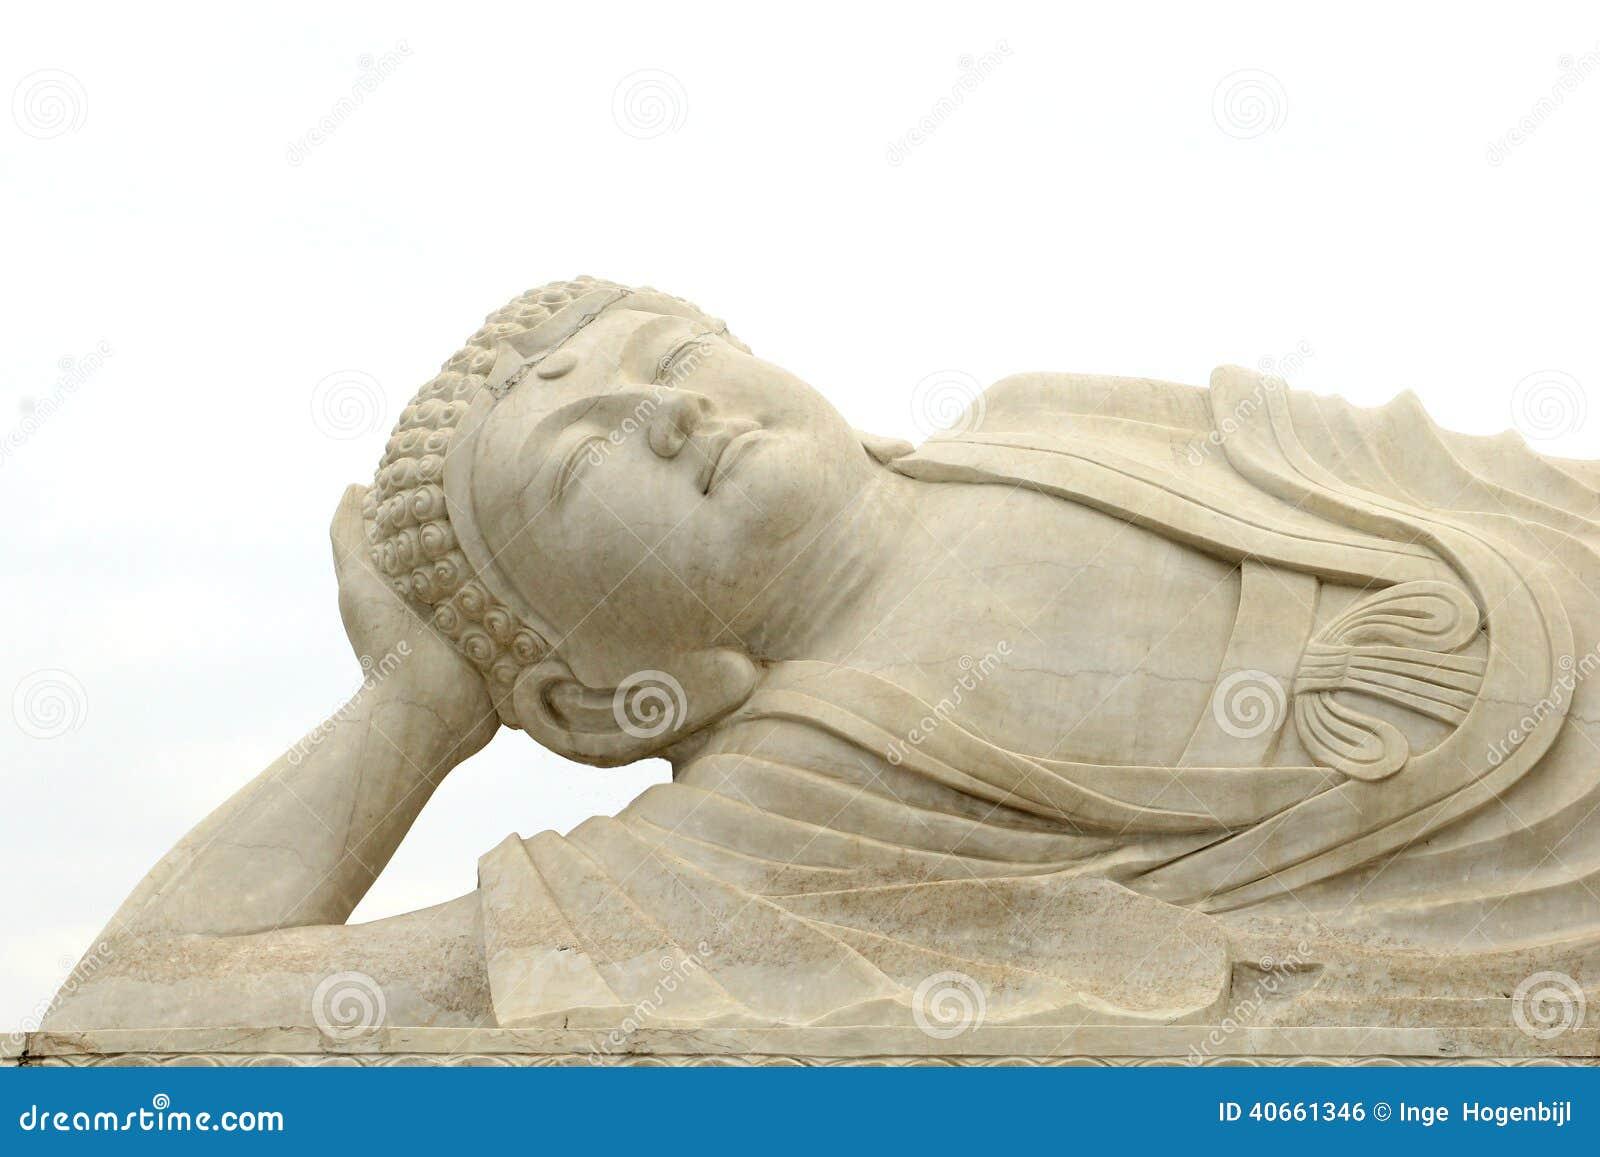 Peaceful white marble zen Buddha statue, China